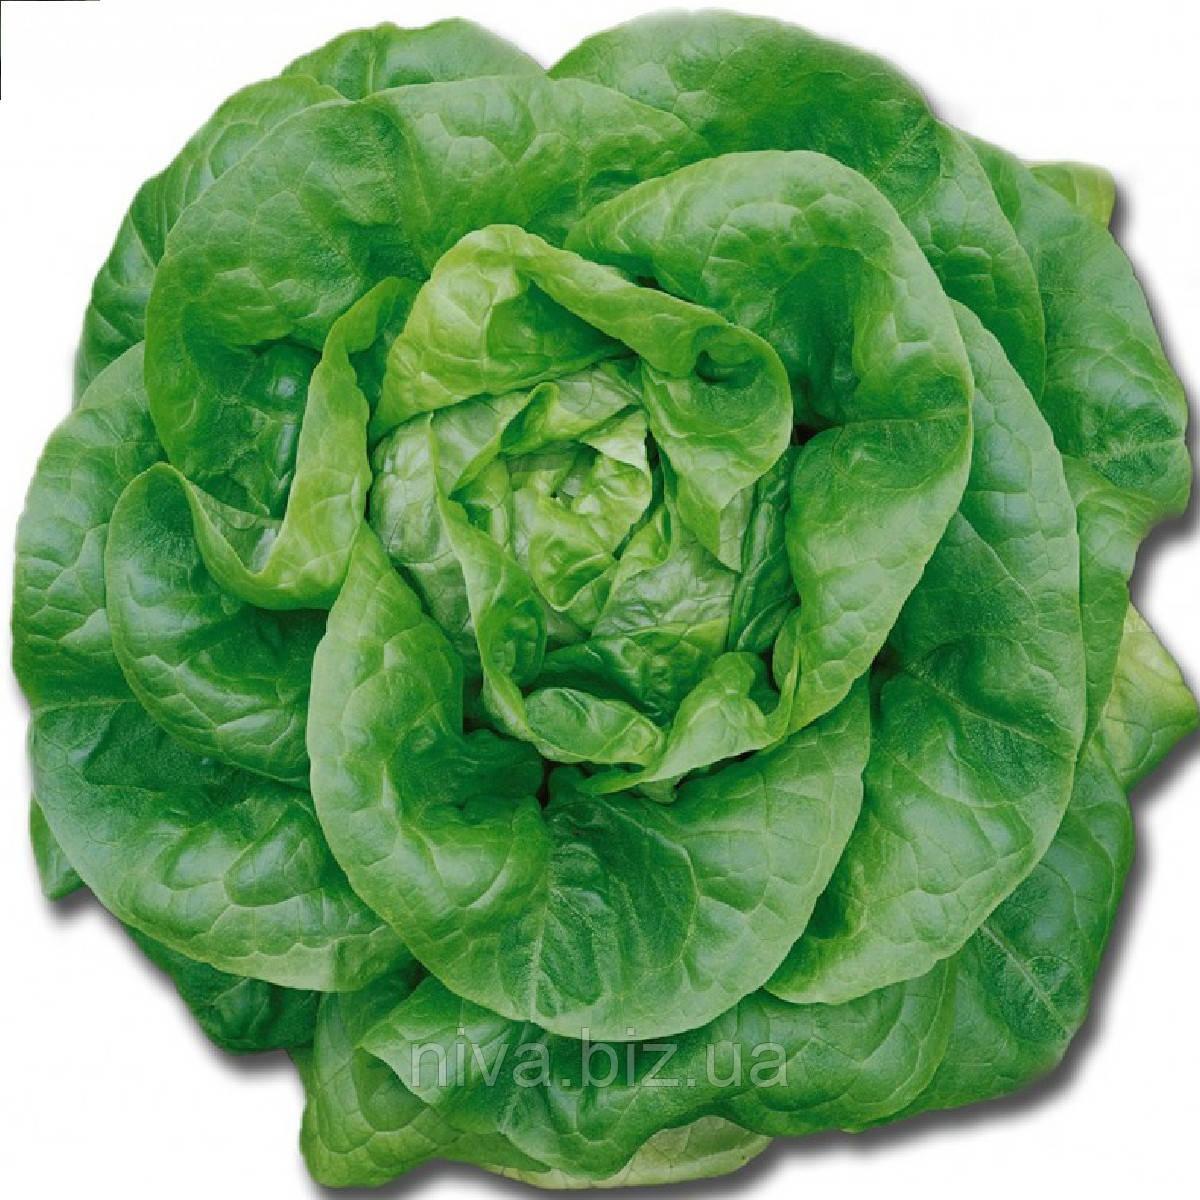 Мона семена салата Кочанного типа Euroseed 50 г